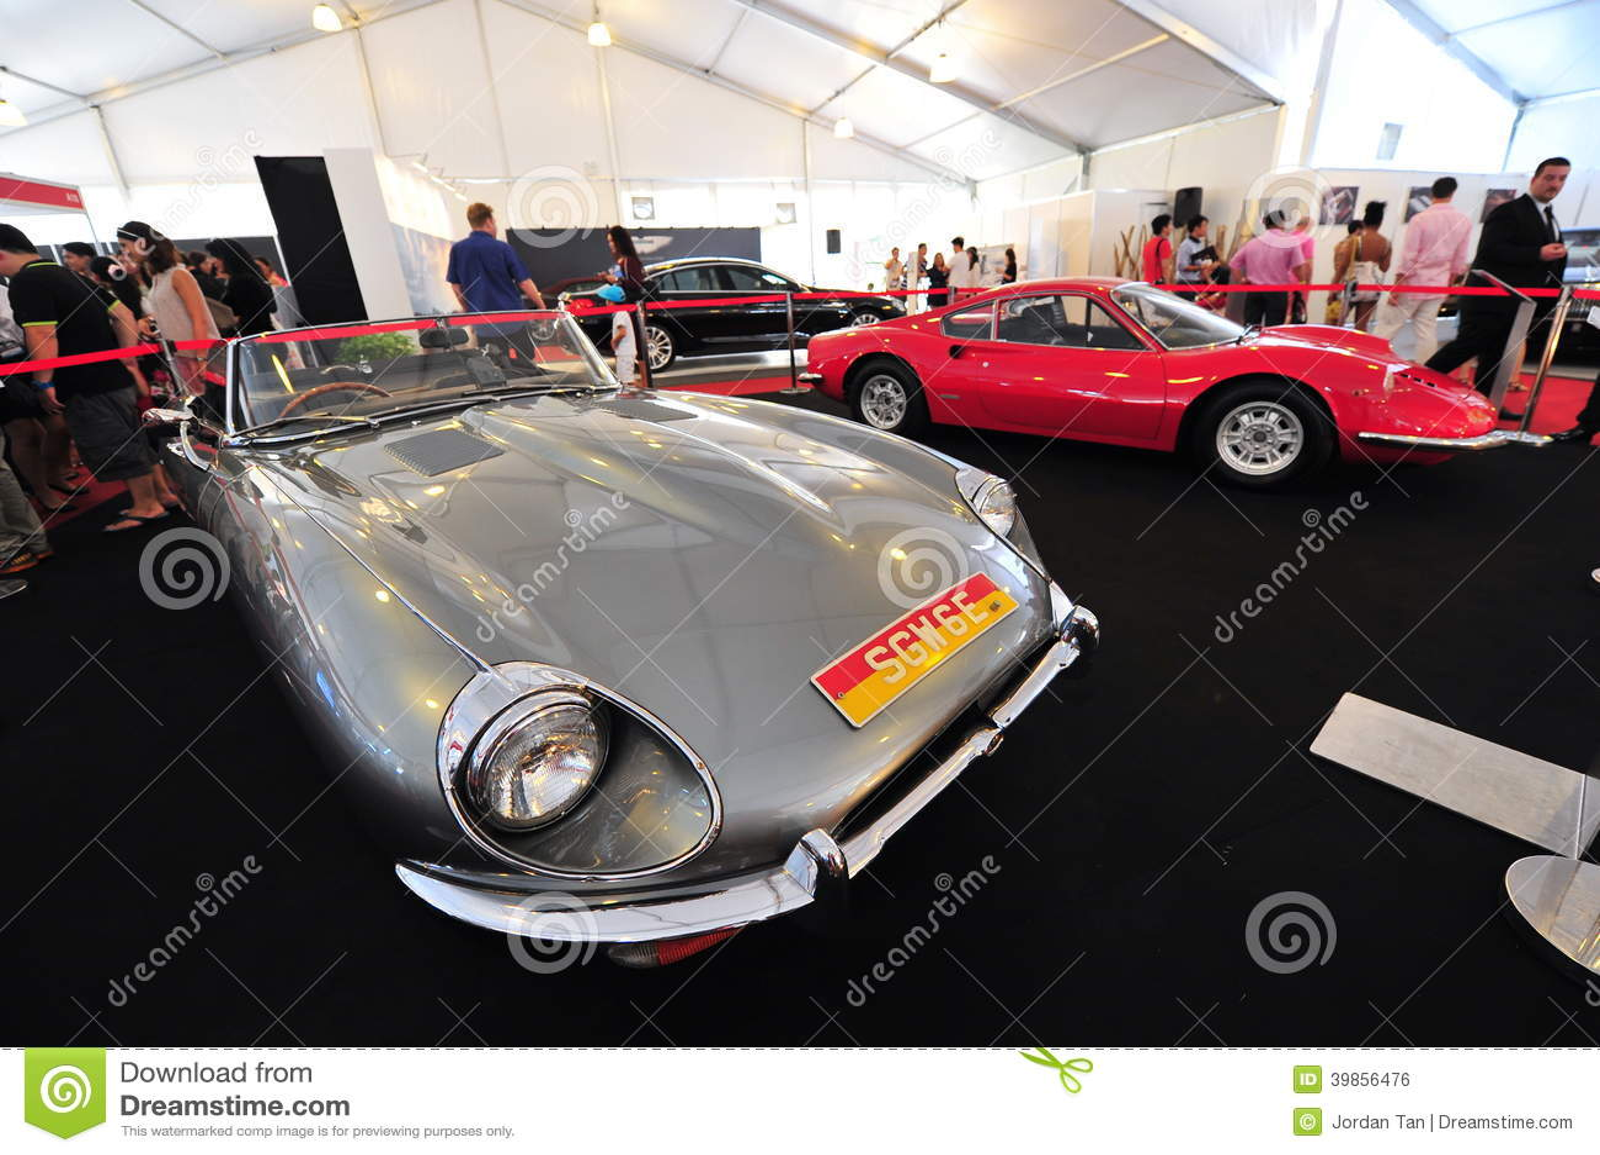 Ferrari Dino Gt And Jaguar E Type Classic Cars On Display